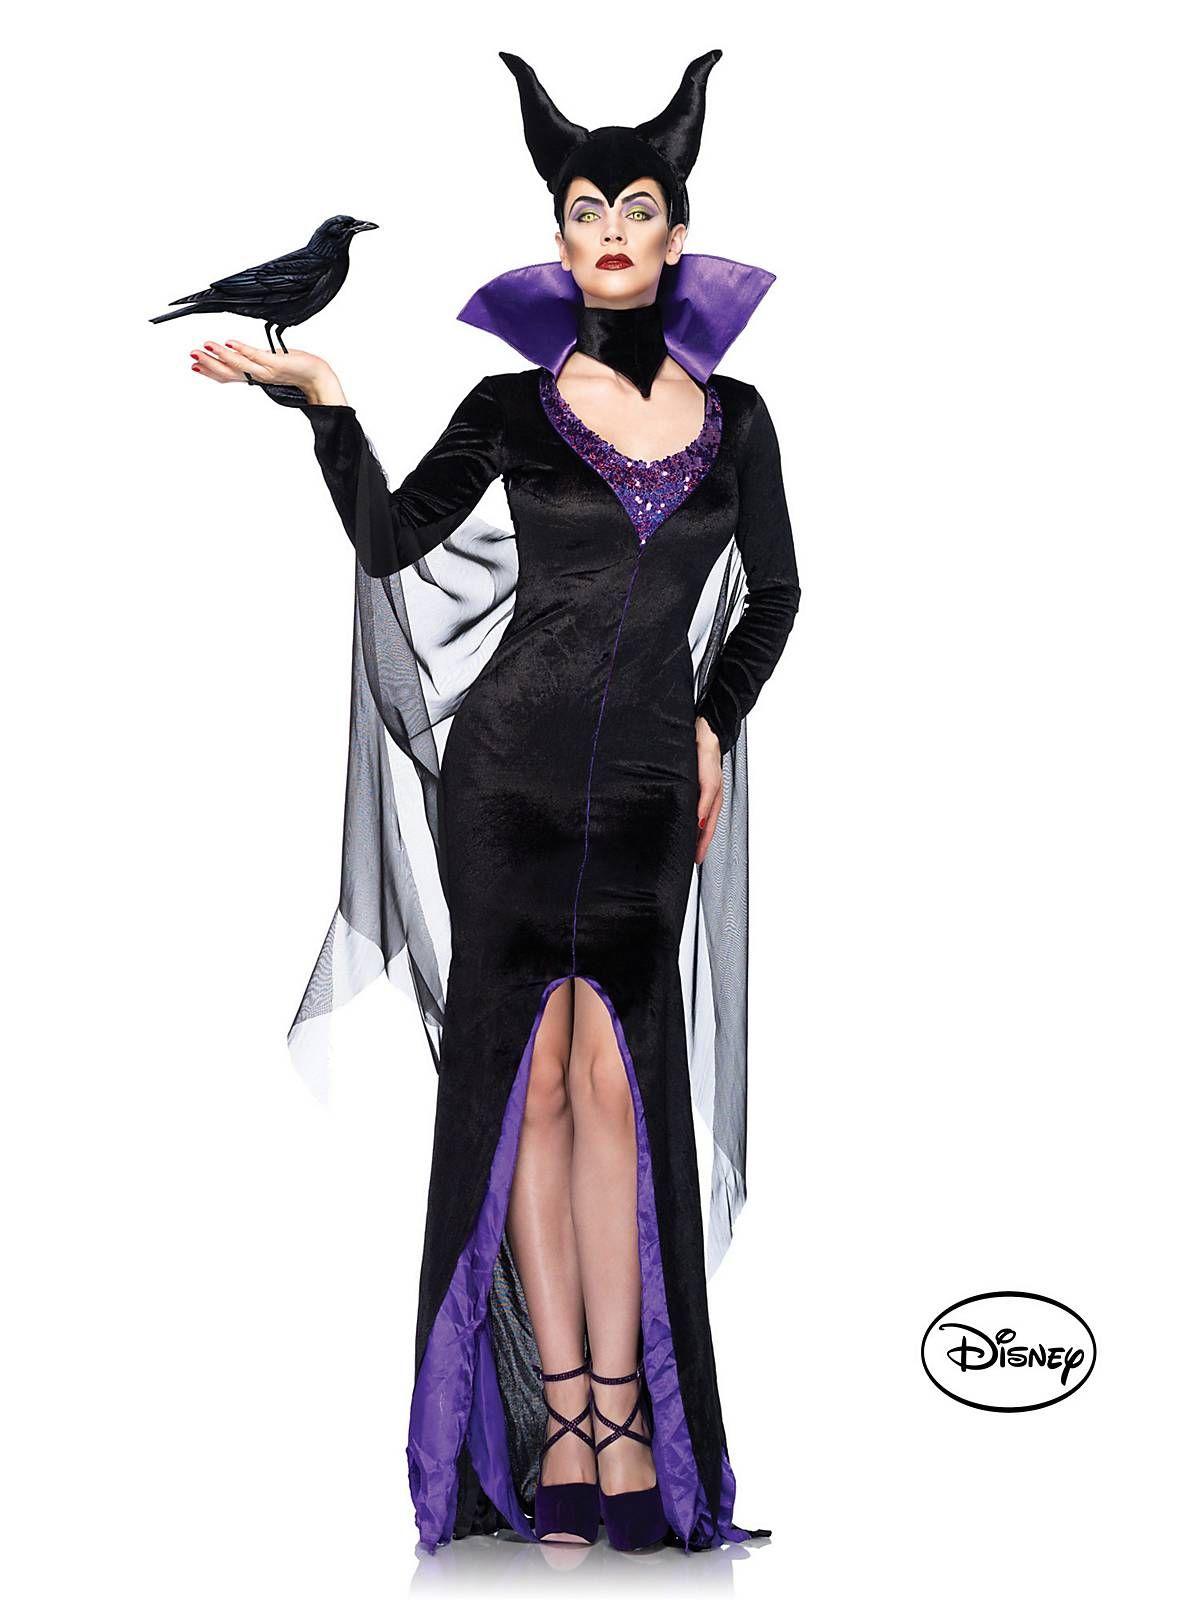 Sleeping Beauty Maleficent Disney Adult Costume See More